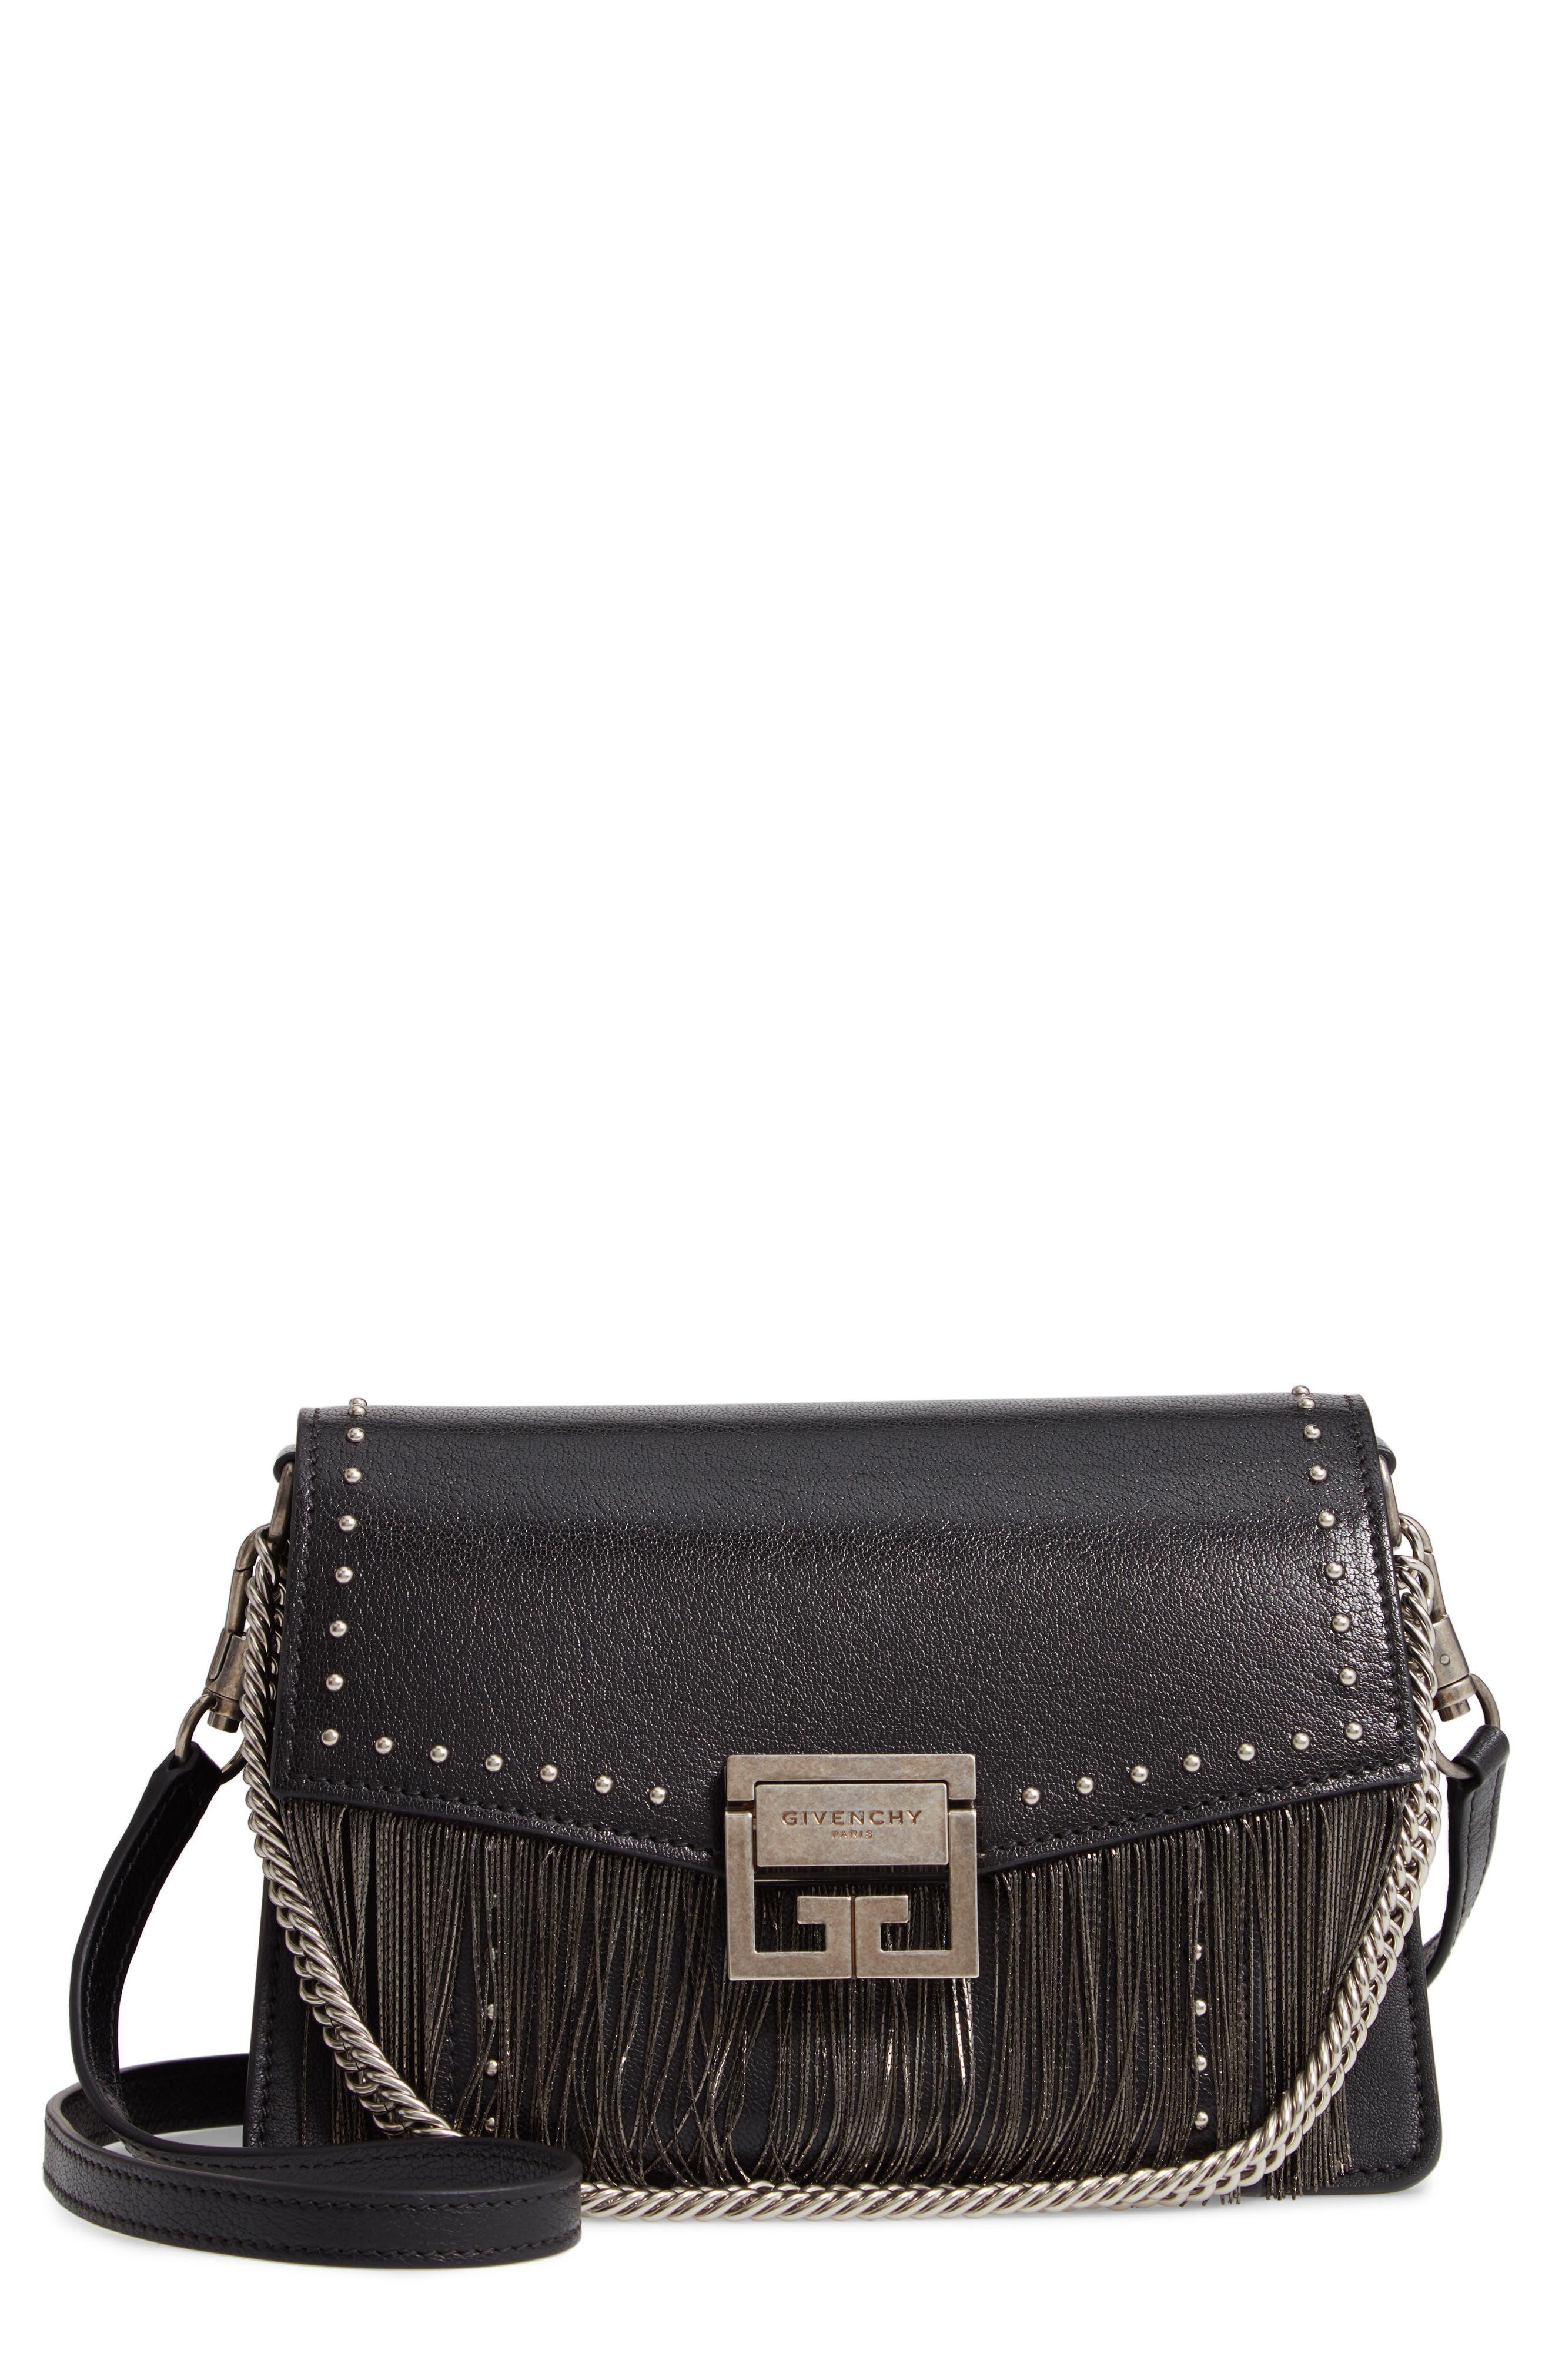 62cfb2818c57 Givenchy Small Gv3 Chain Fringe Leather Crossbody Bag - Black